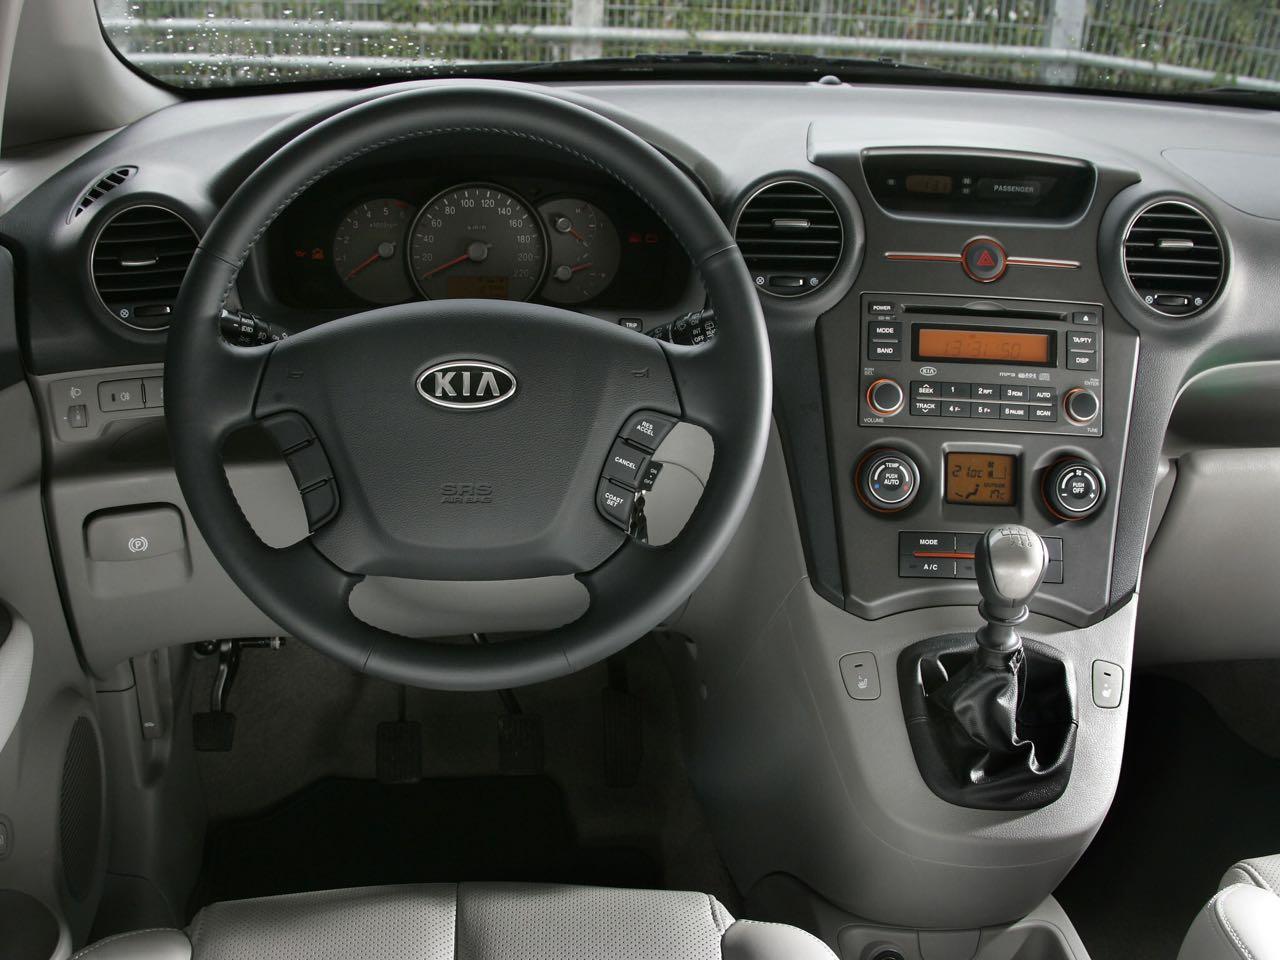 Kia Carens 2006 interior